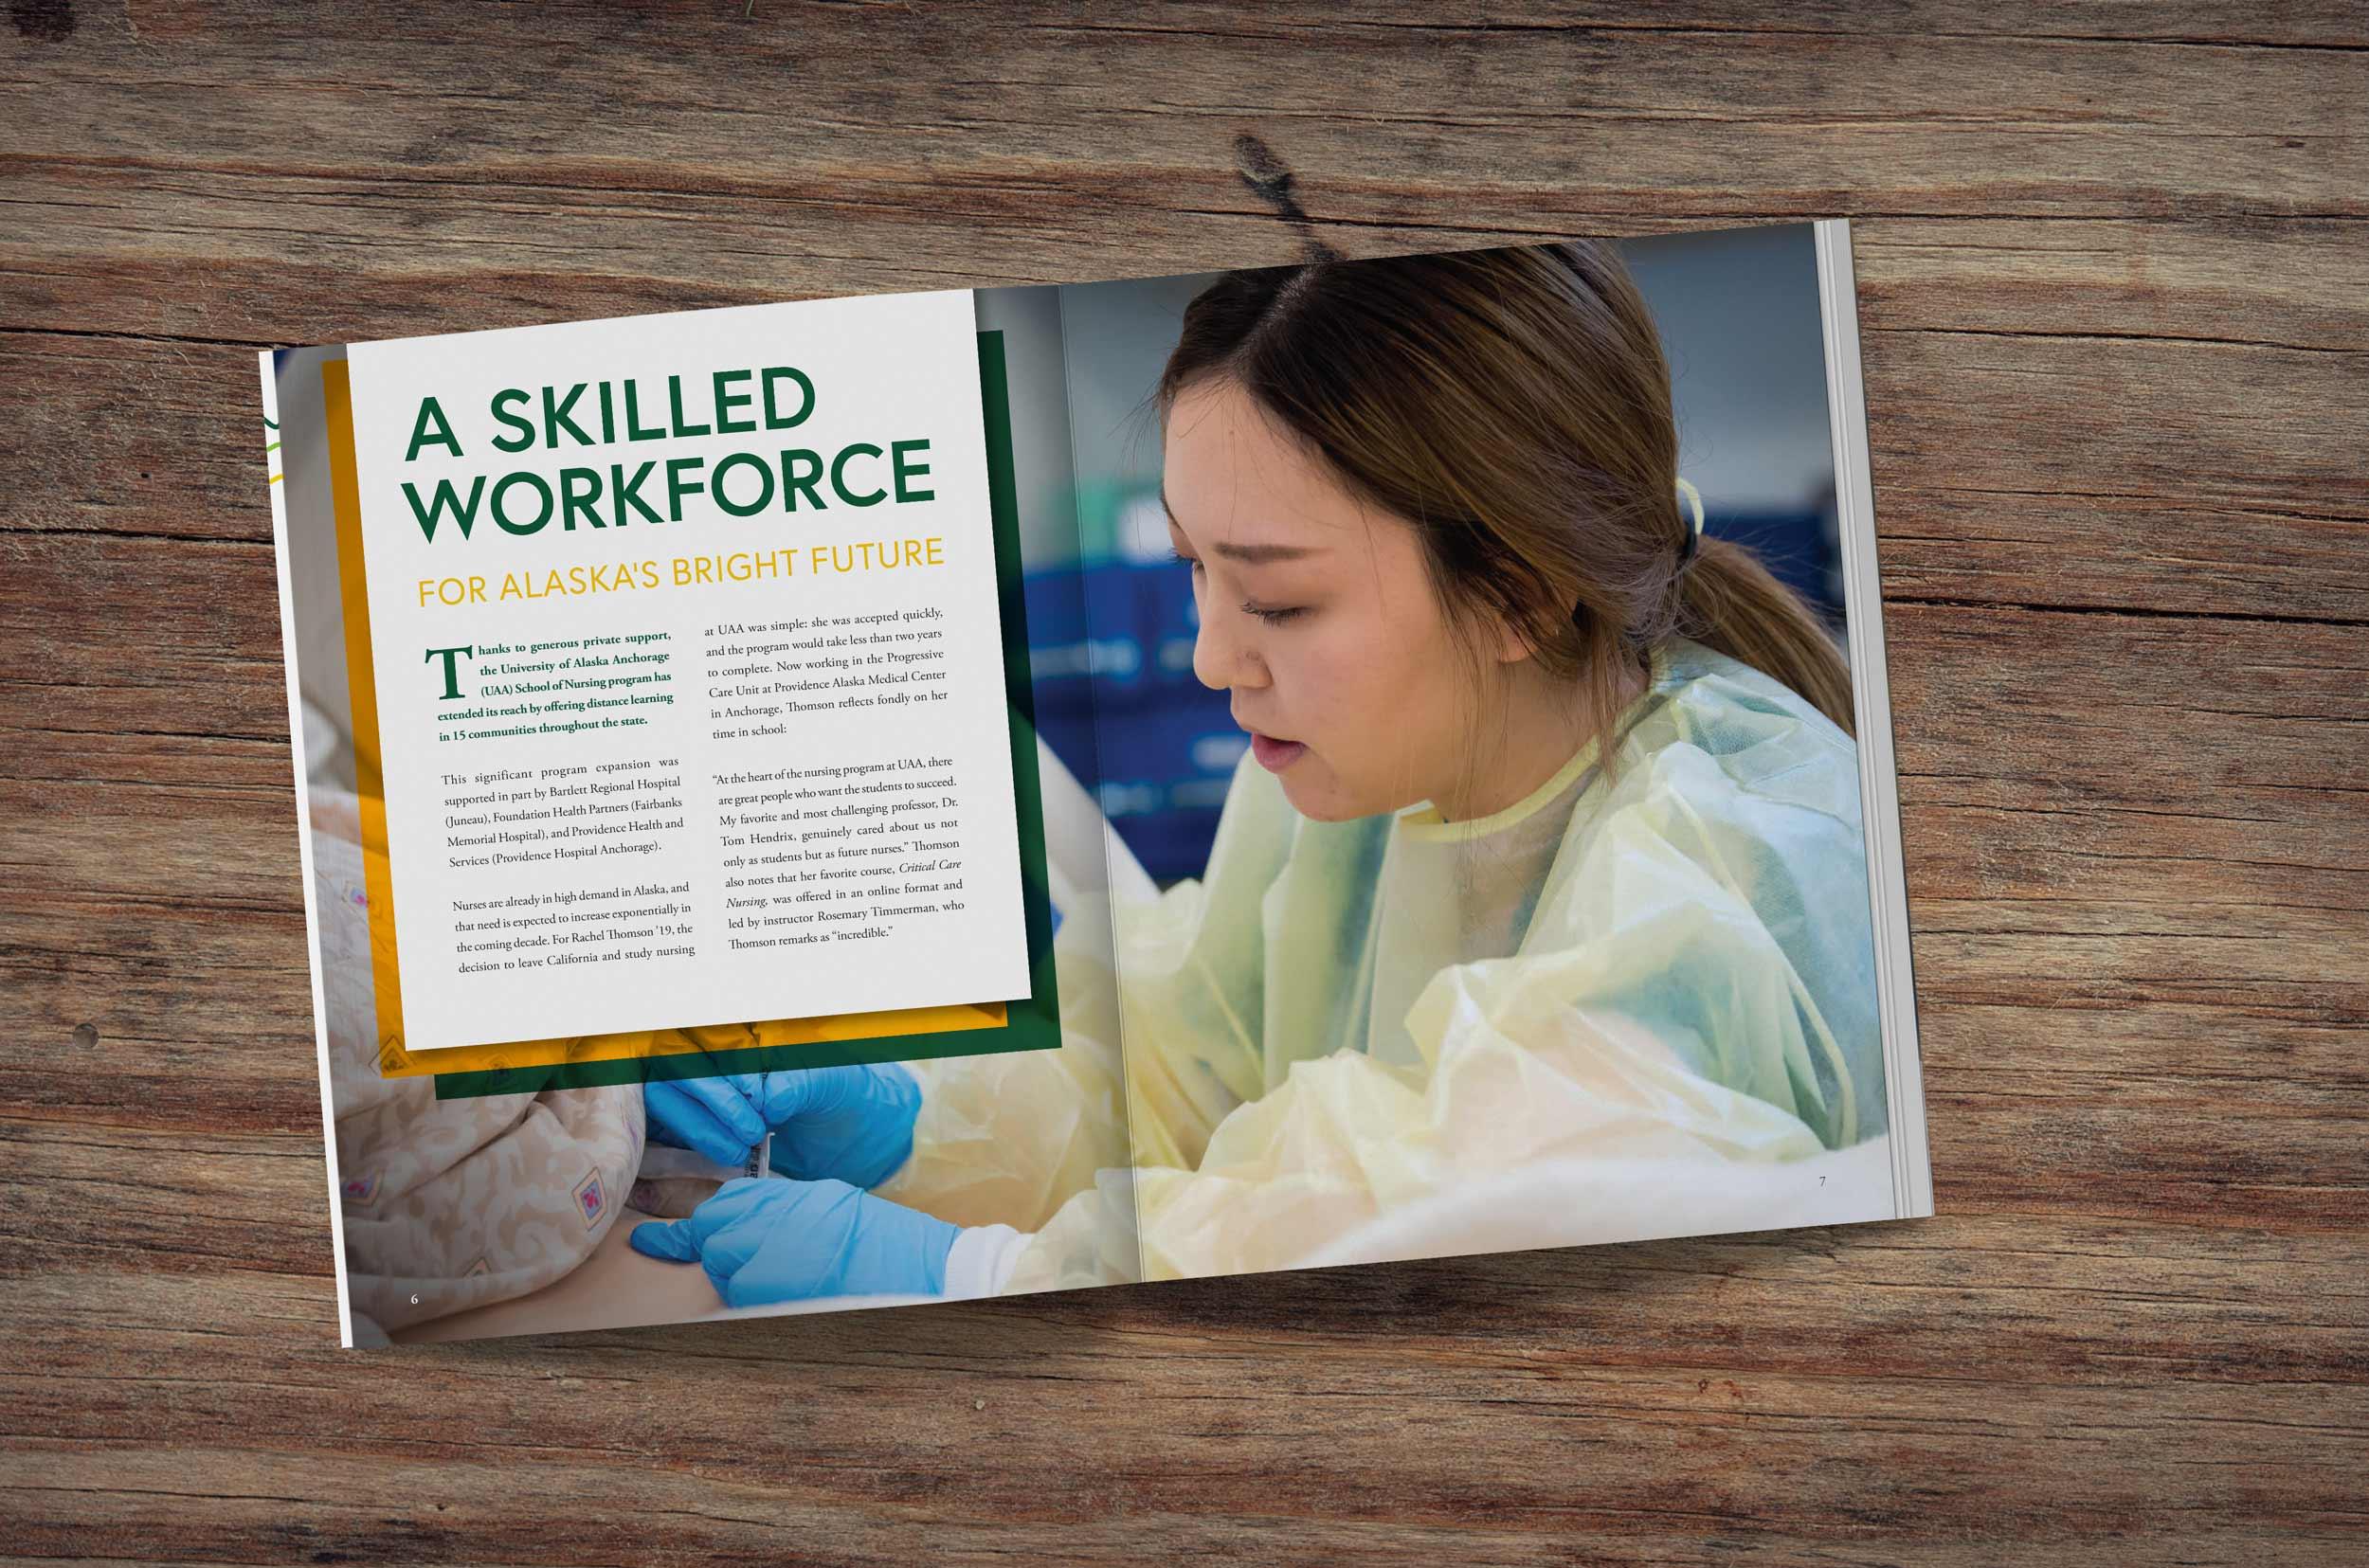 University of Alaska annual report